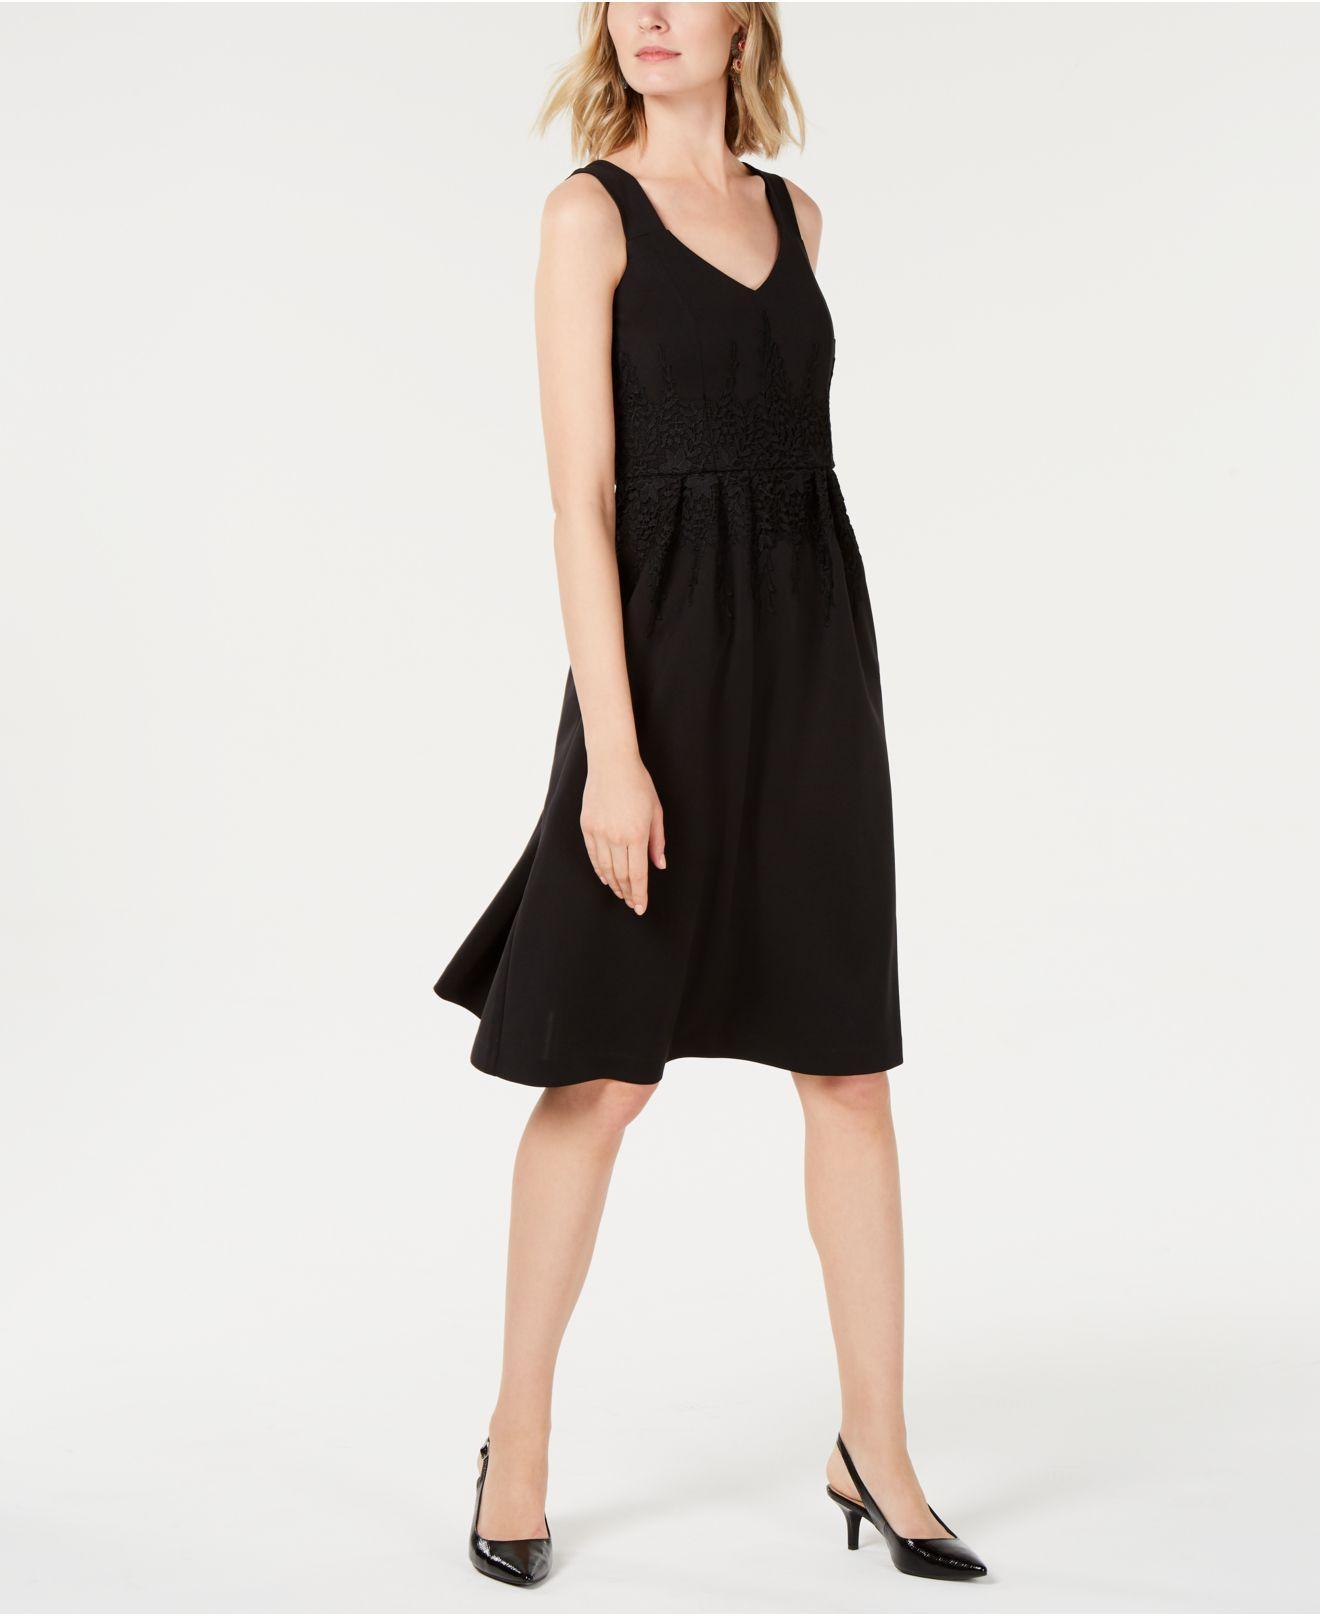 Curvy Fit Lace Trim Midi Dress Created For Macys